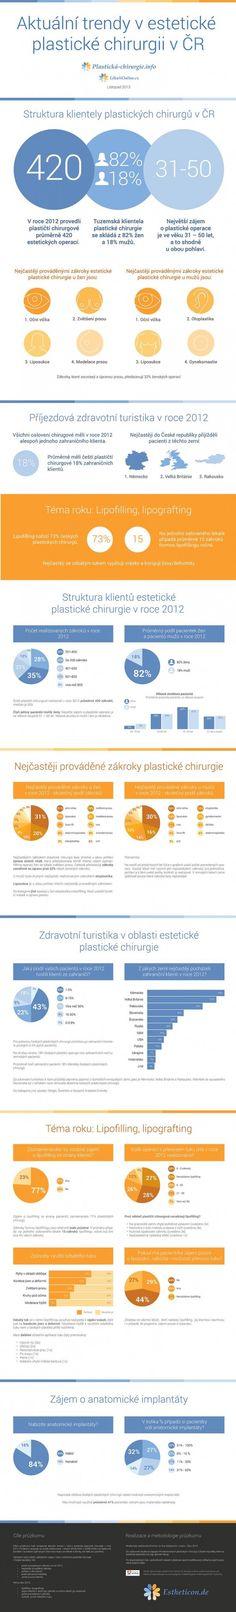 Aktualni trendy v esteticke plasticke chirurgii v CR - infografika